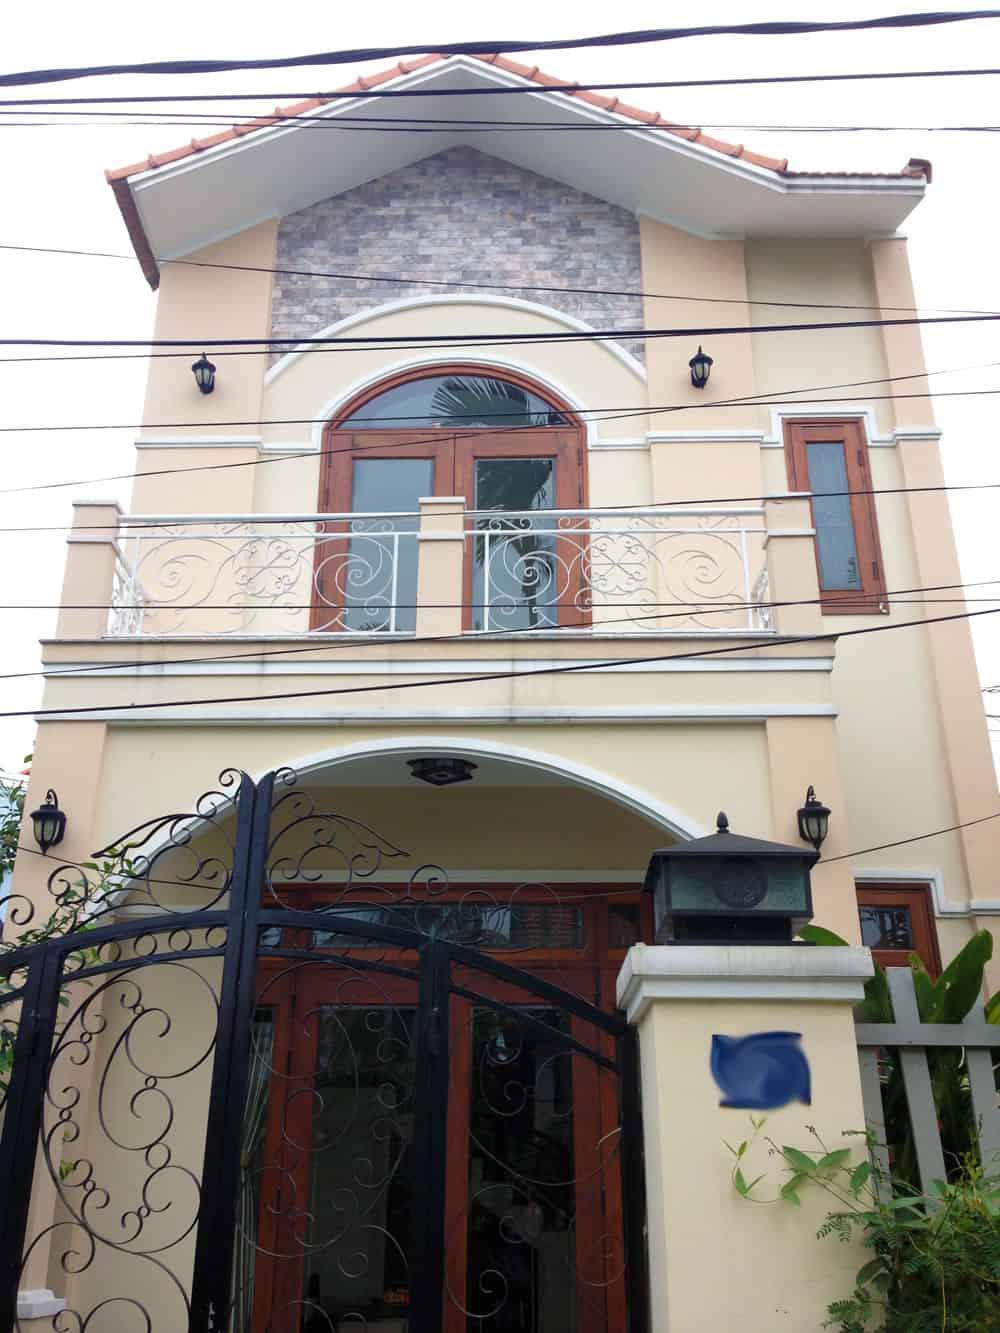 House in Hoi An